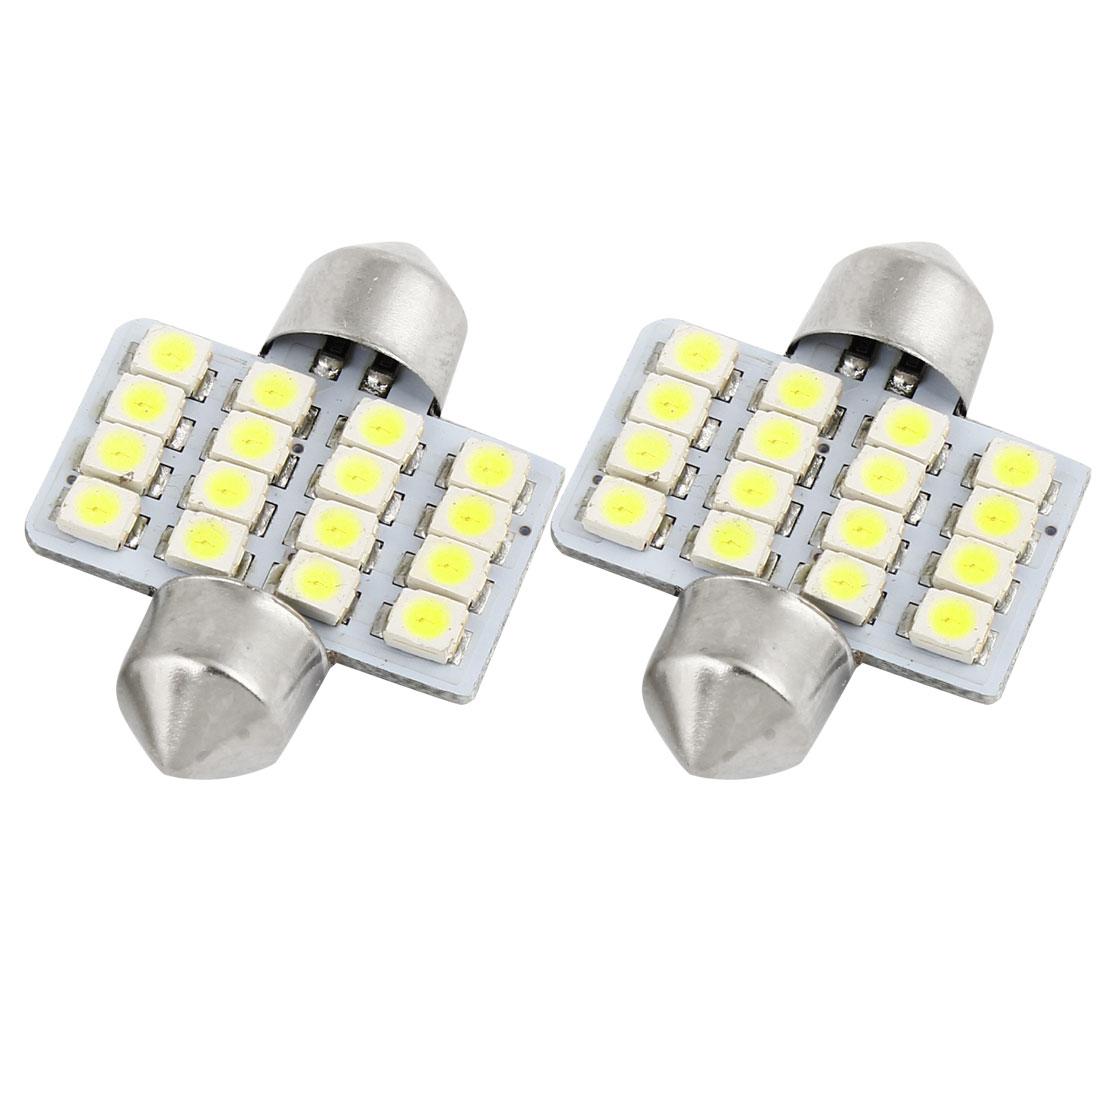 2Pcs 31mm 3528 16 SMD White Car Festoon Dome LED Light Lamp 3175 3022 Internal